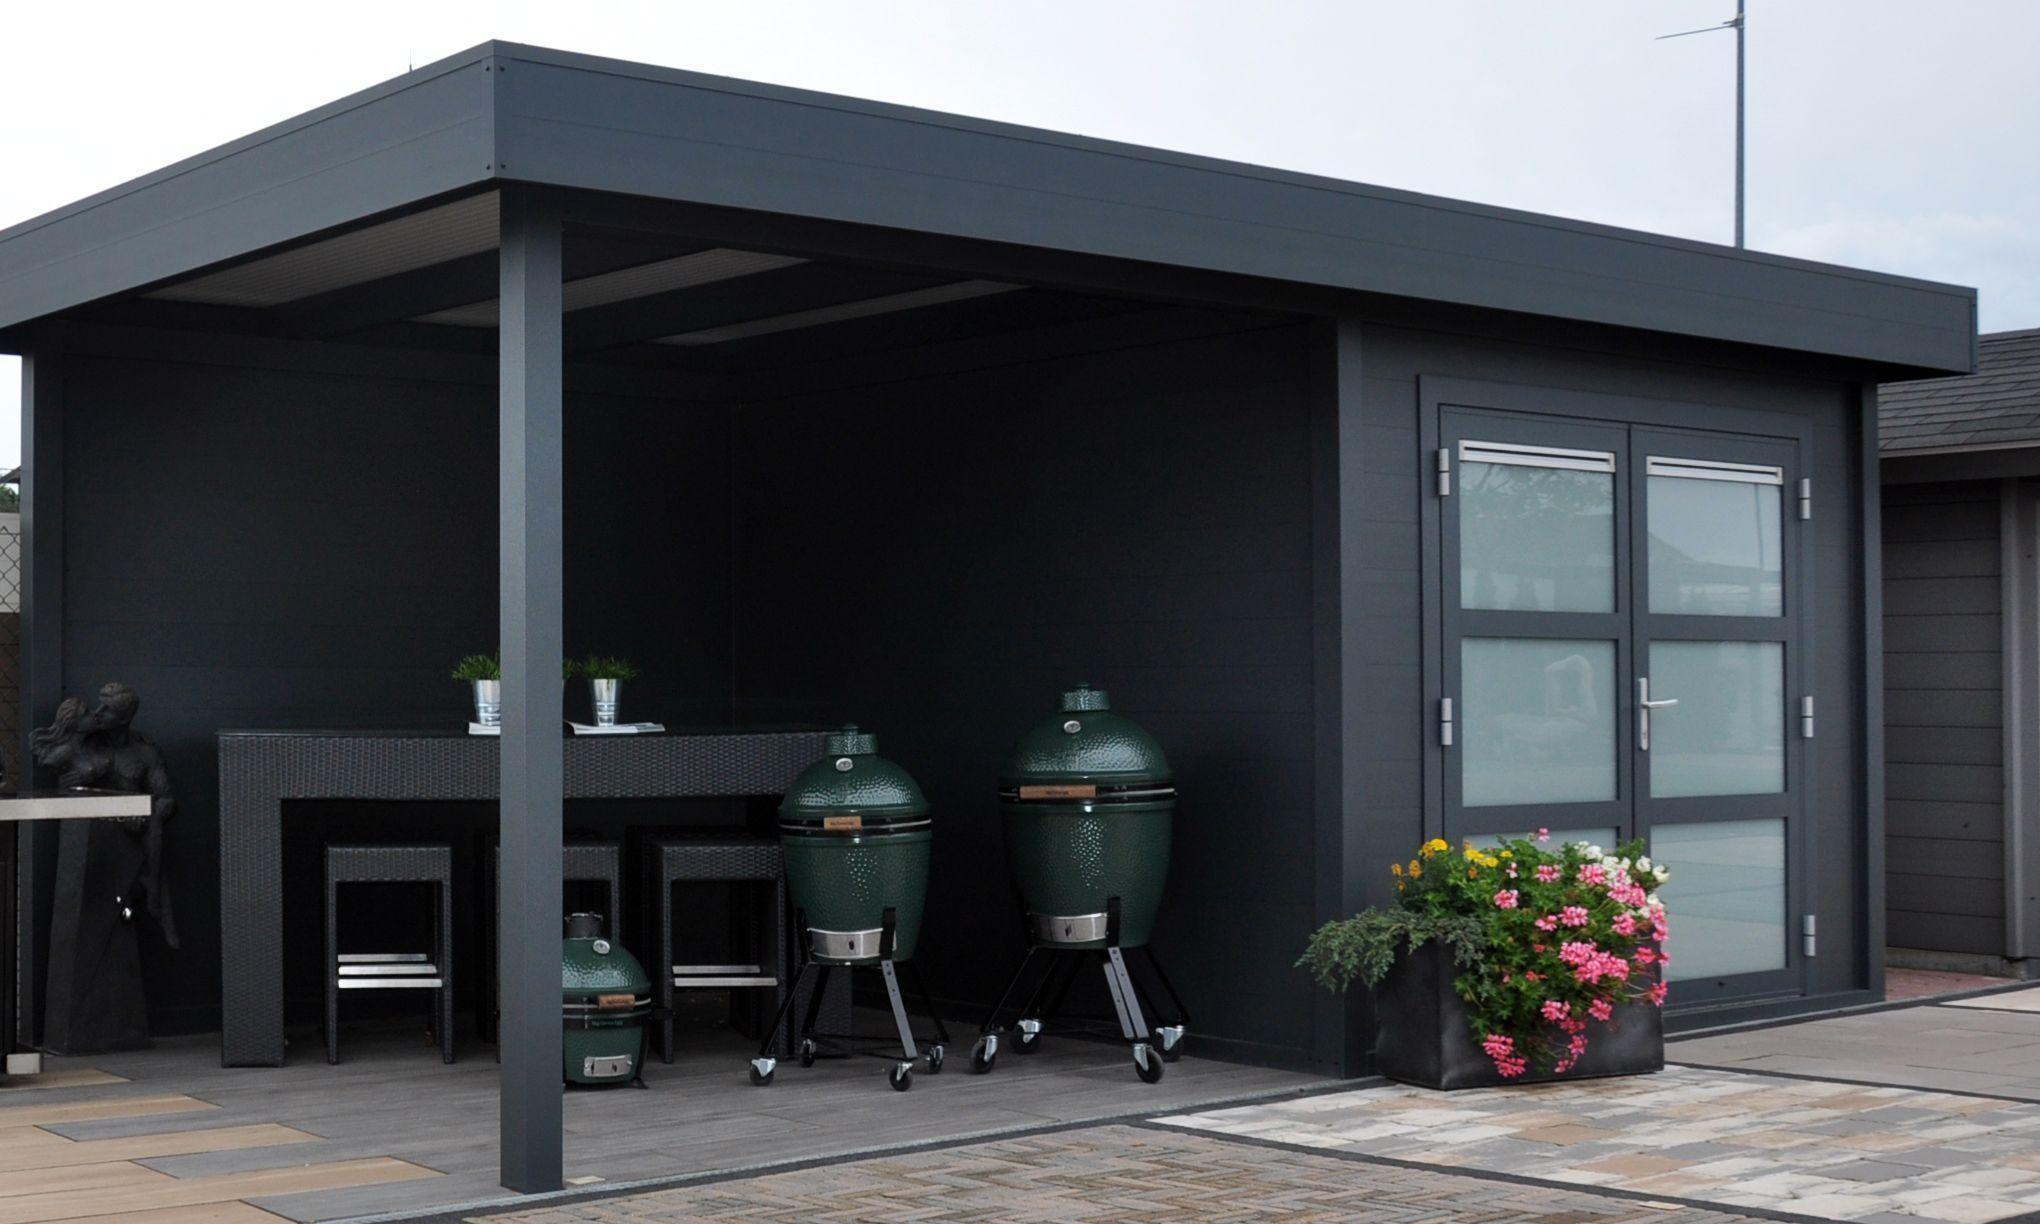 Modernes Flachdach Gartenhaus aus Aluminium mit